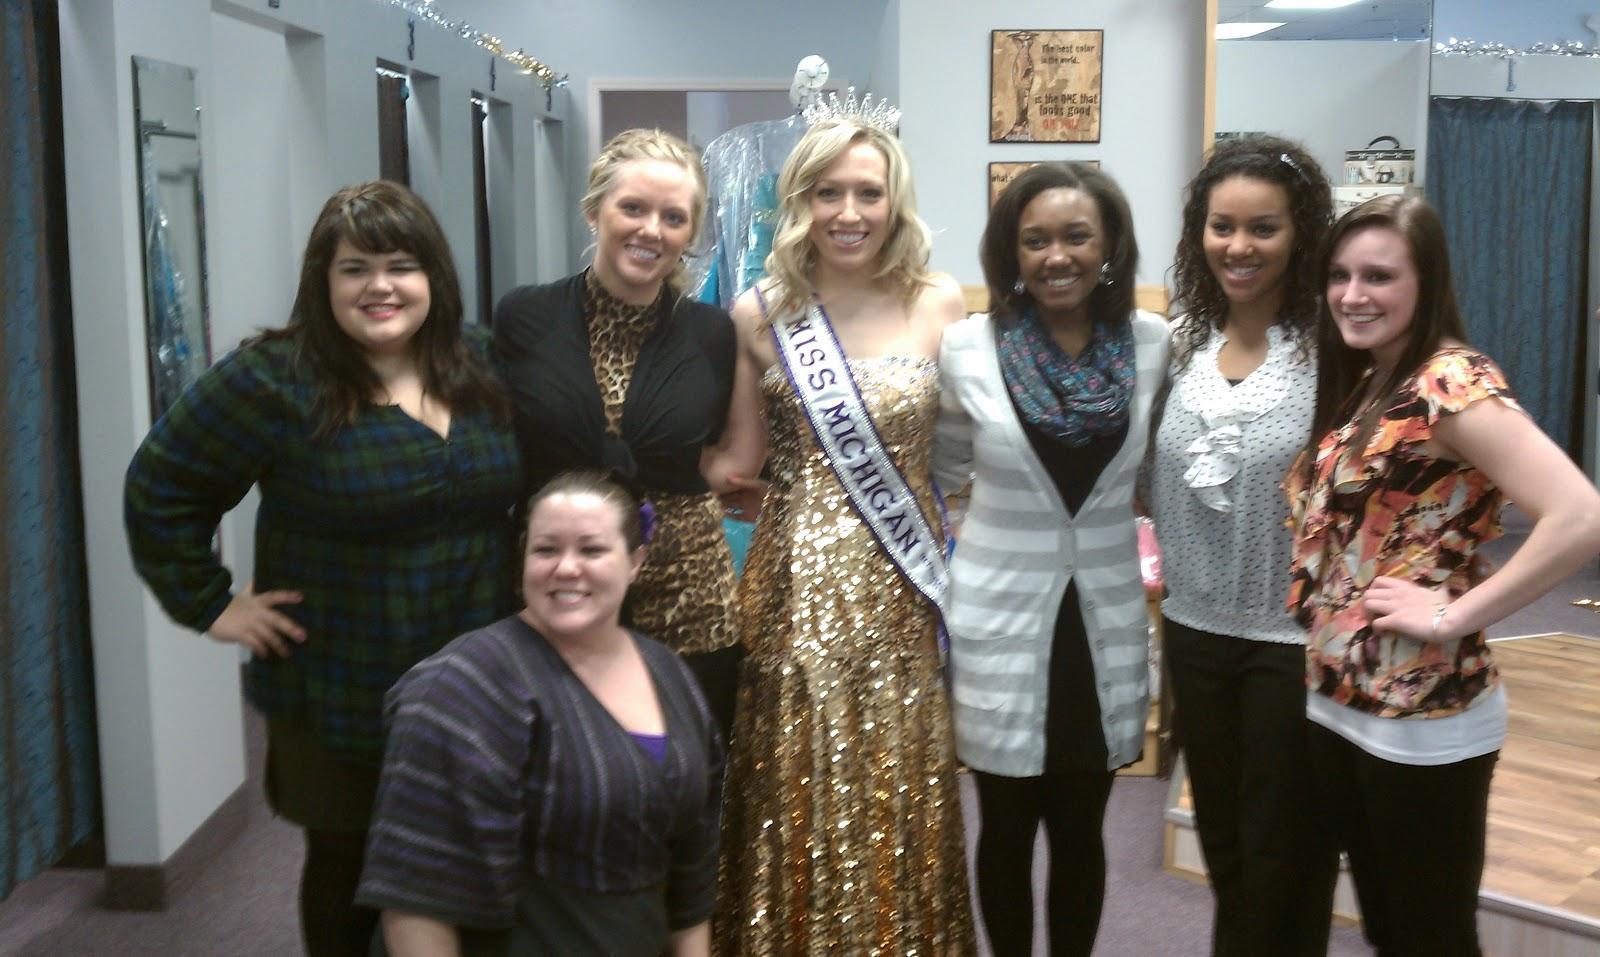 Miss Michigan International 2012: Nothing is more fun than